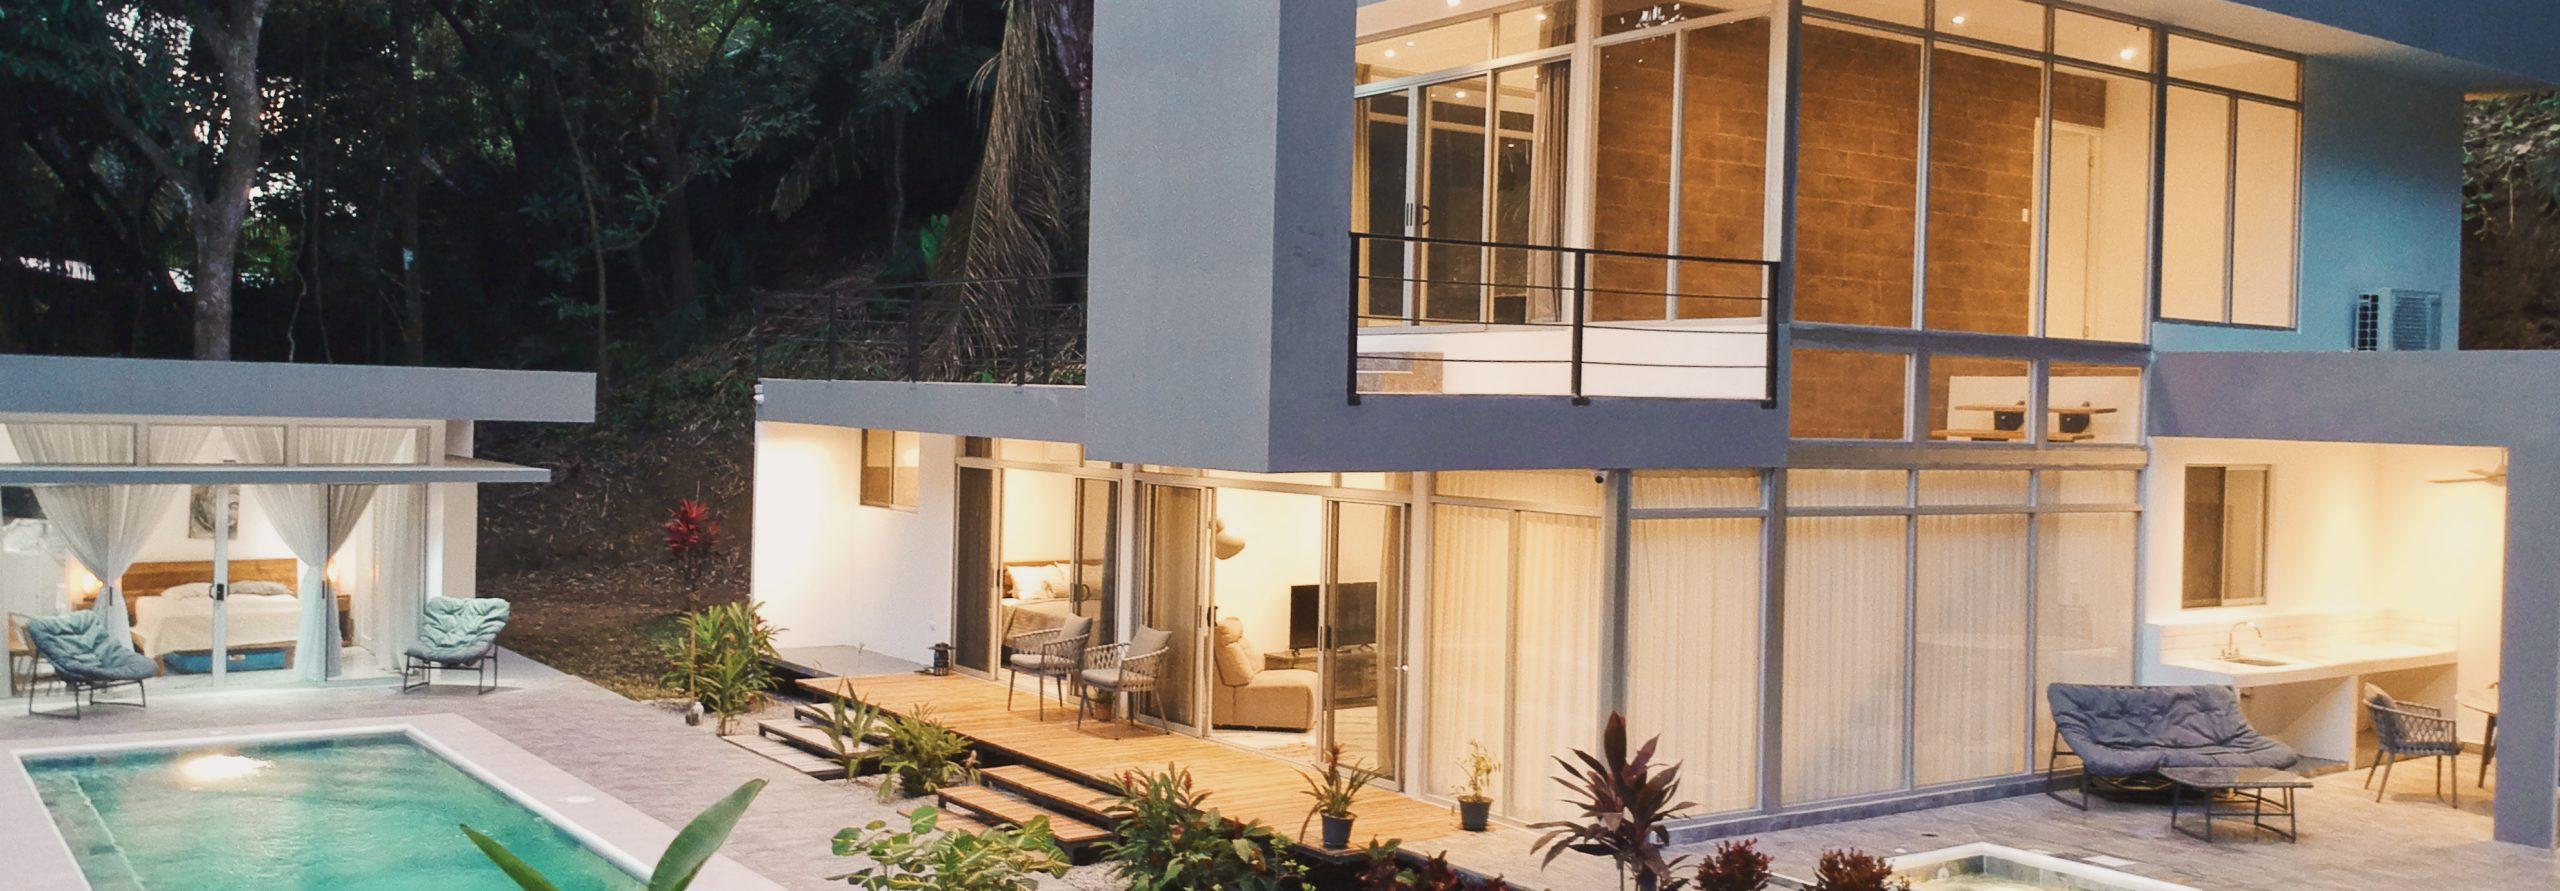 Brand New Jungle Home In Samara!